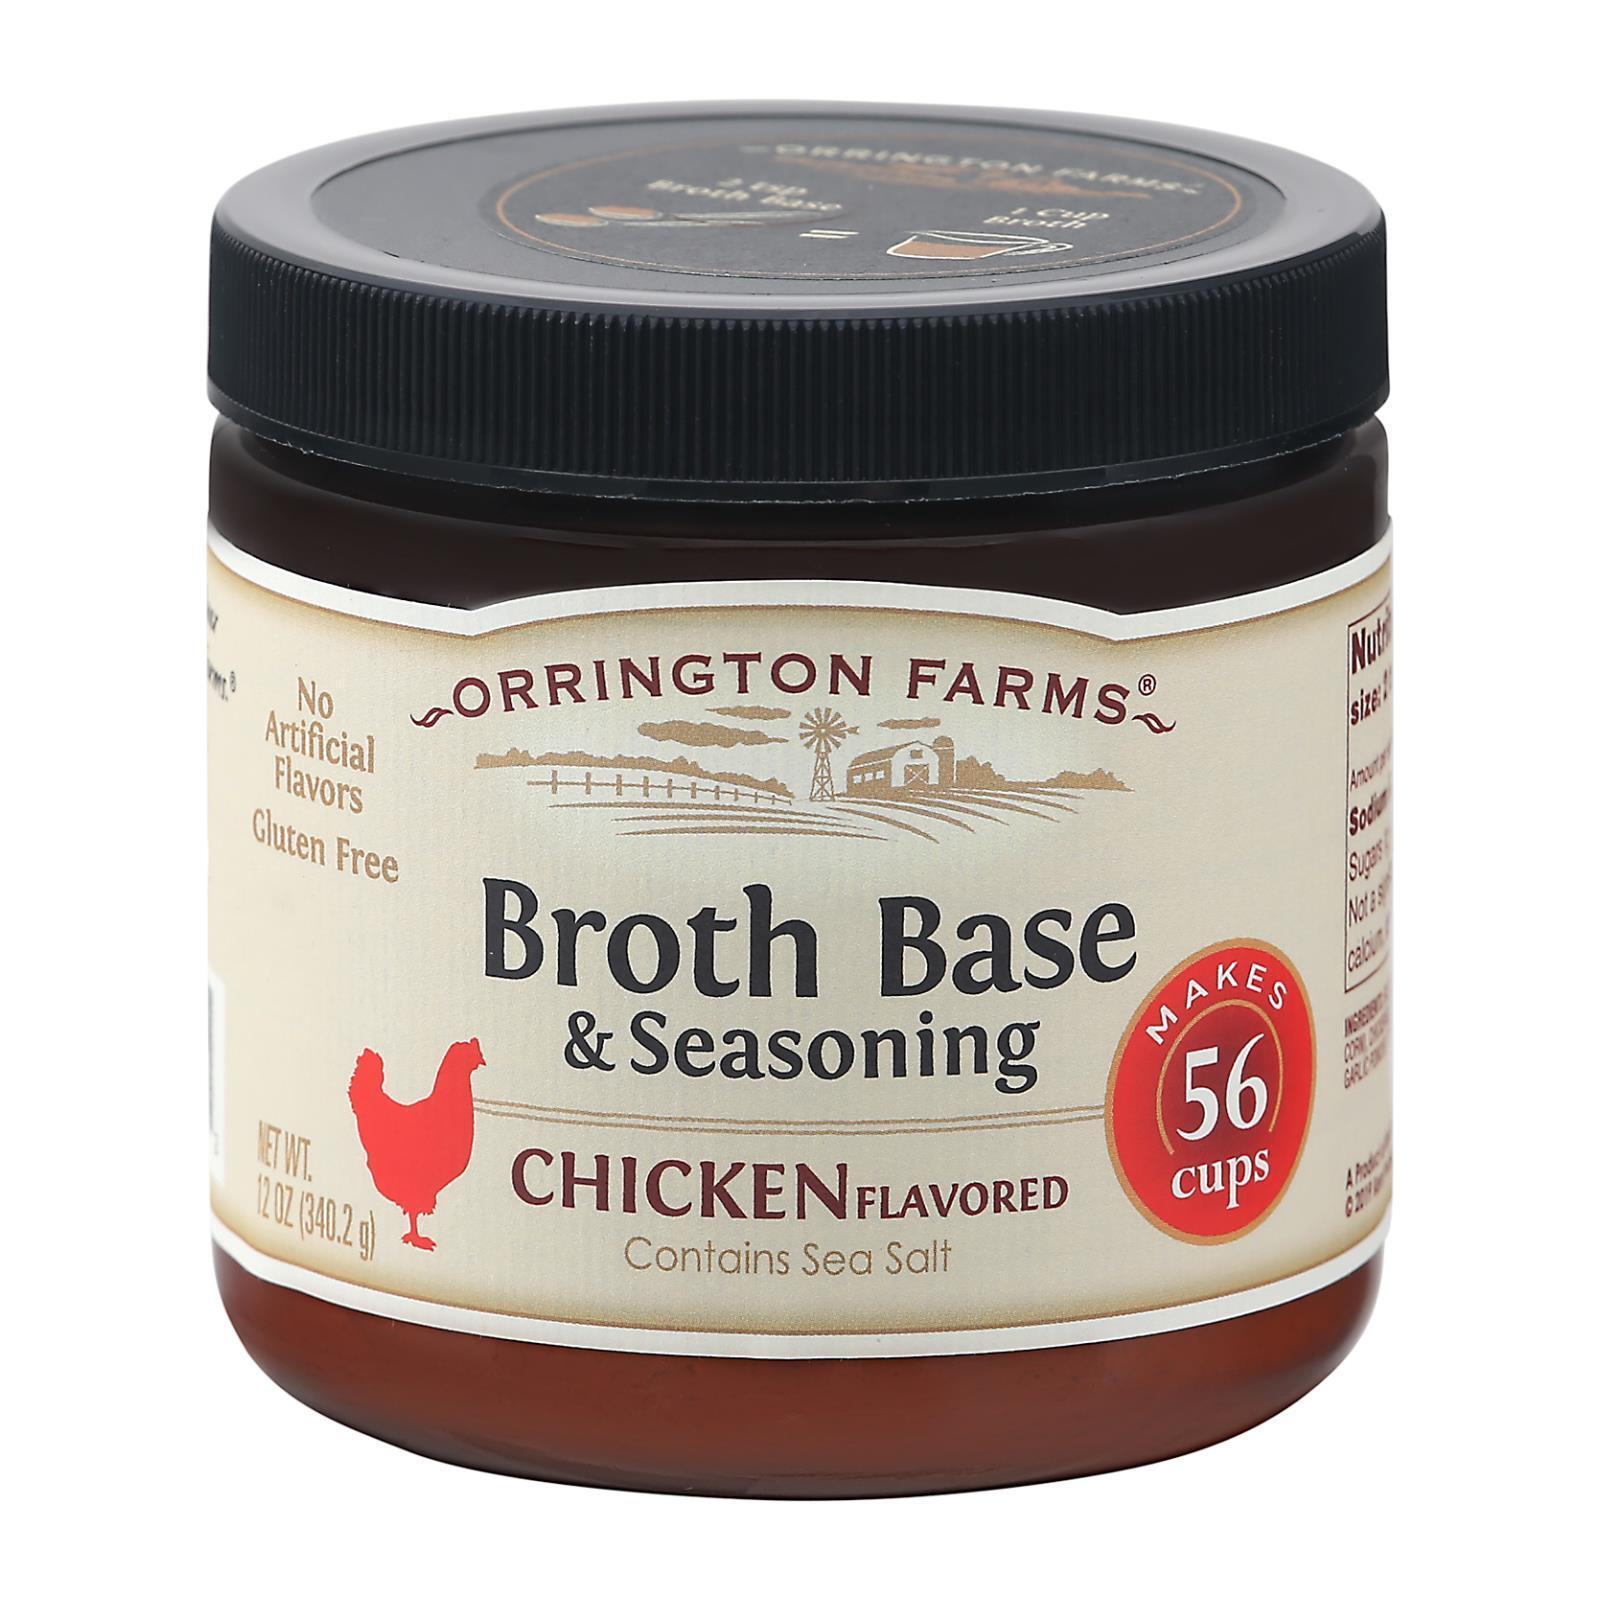 Orrington Farms Broth Base and Seasoning - Chicken - Case of 6 - 12 oz.